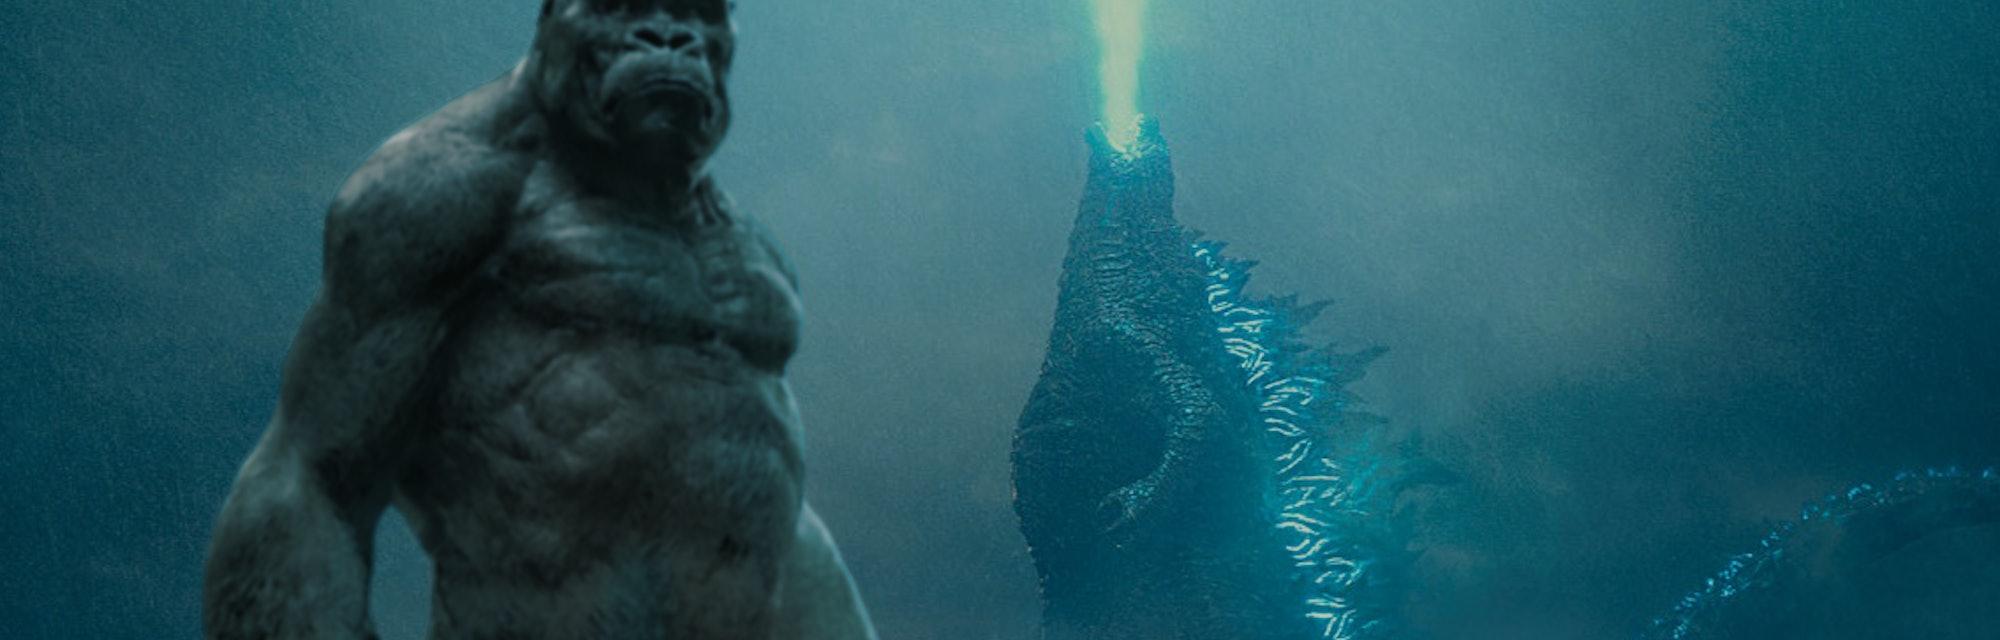 Godzilla Vs Kong Release Date Trailer Cast For The Next Monster Brawl